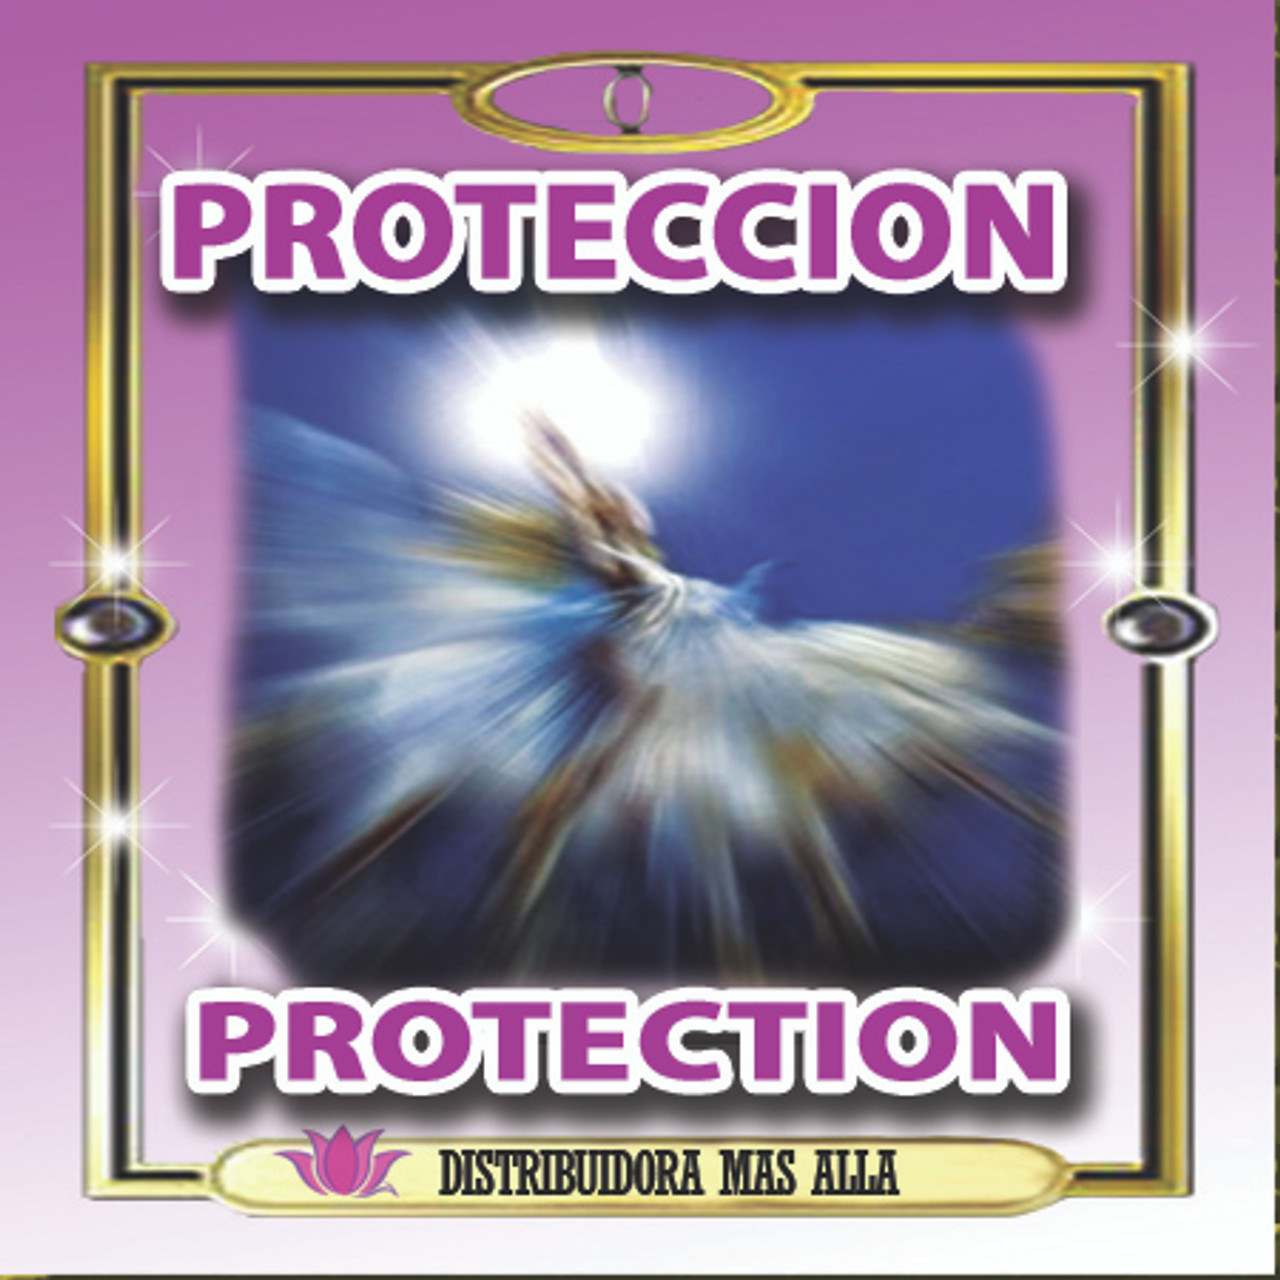 Polvo Proteccion - Protection Powder